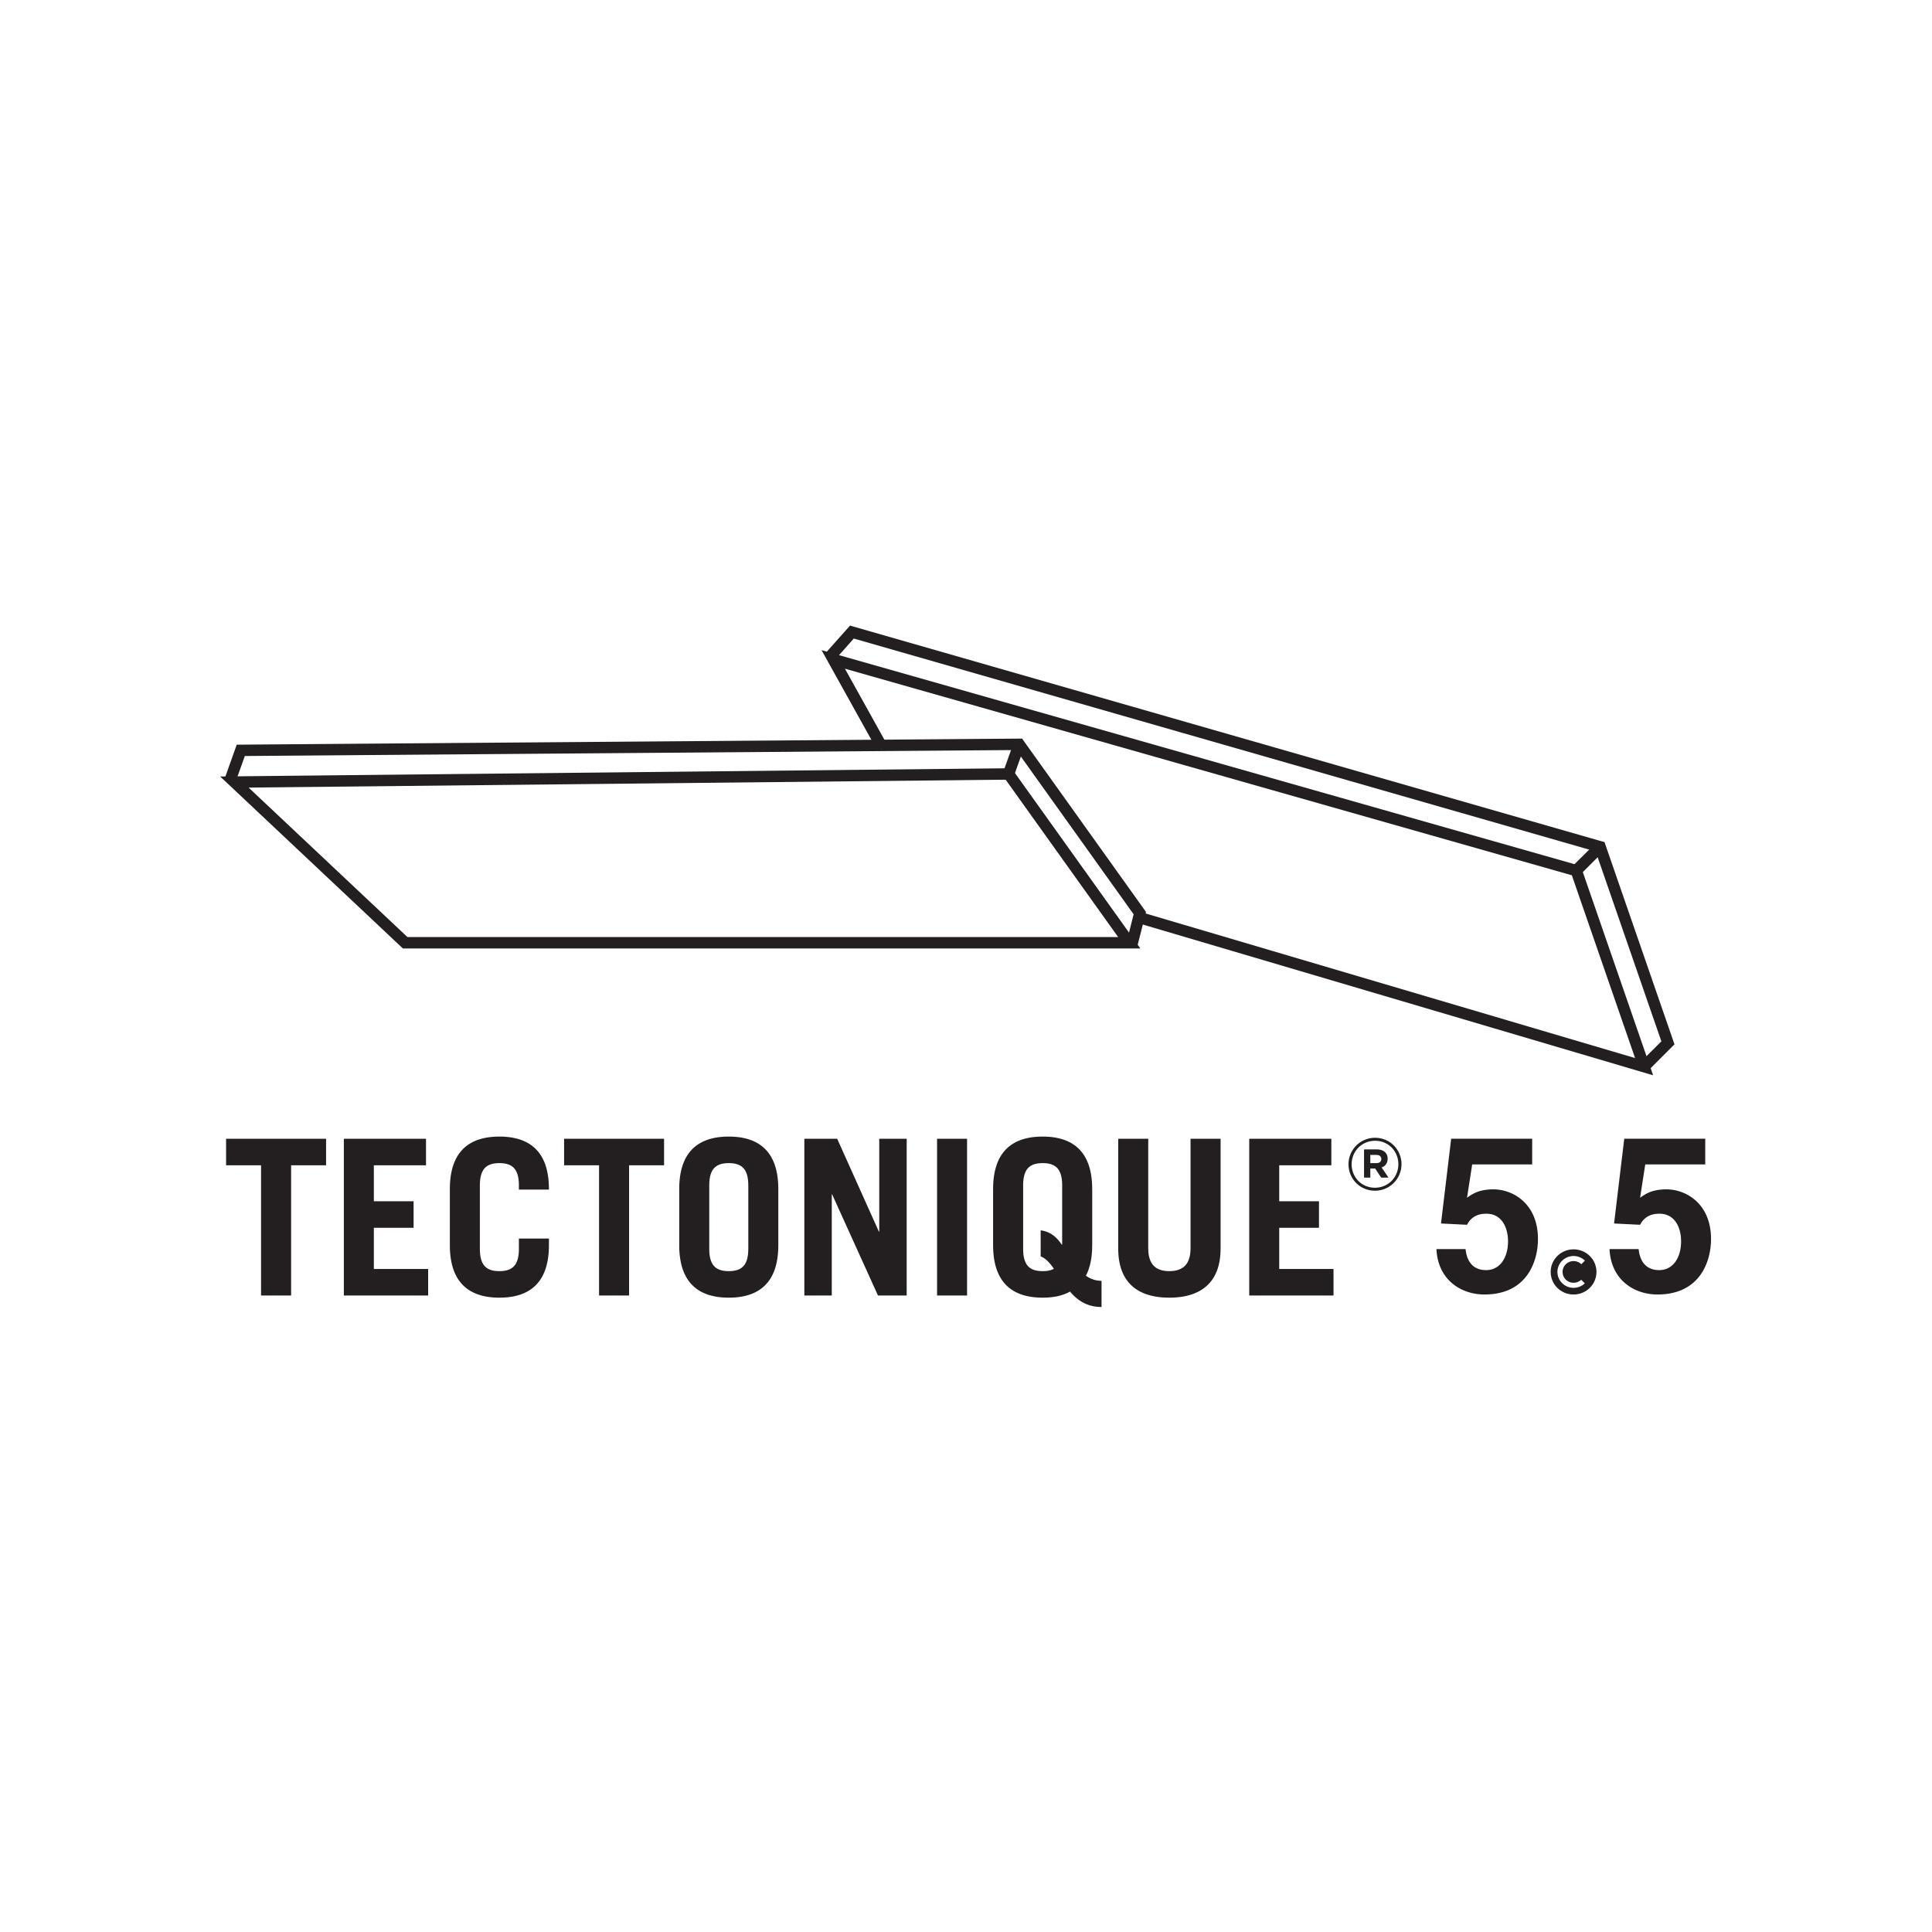 tectonique-logo.jpg